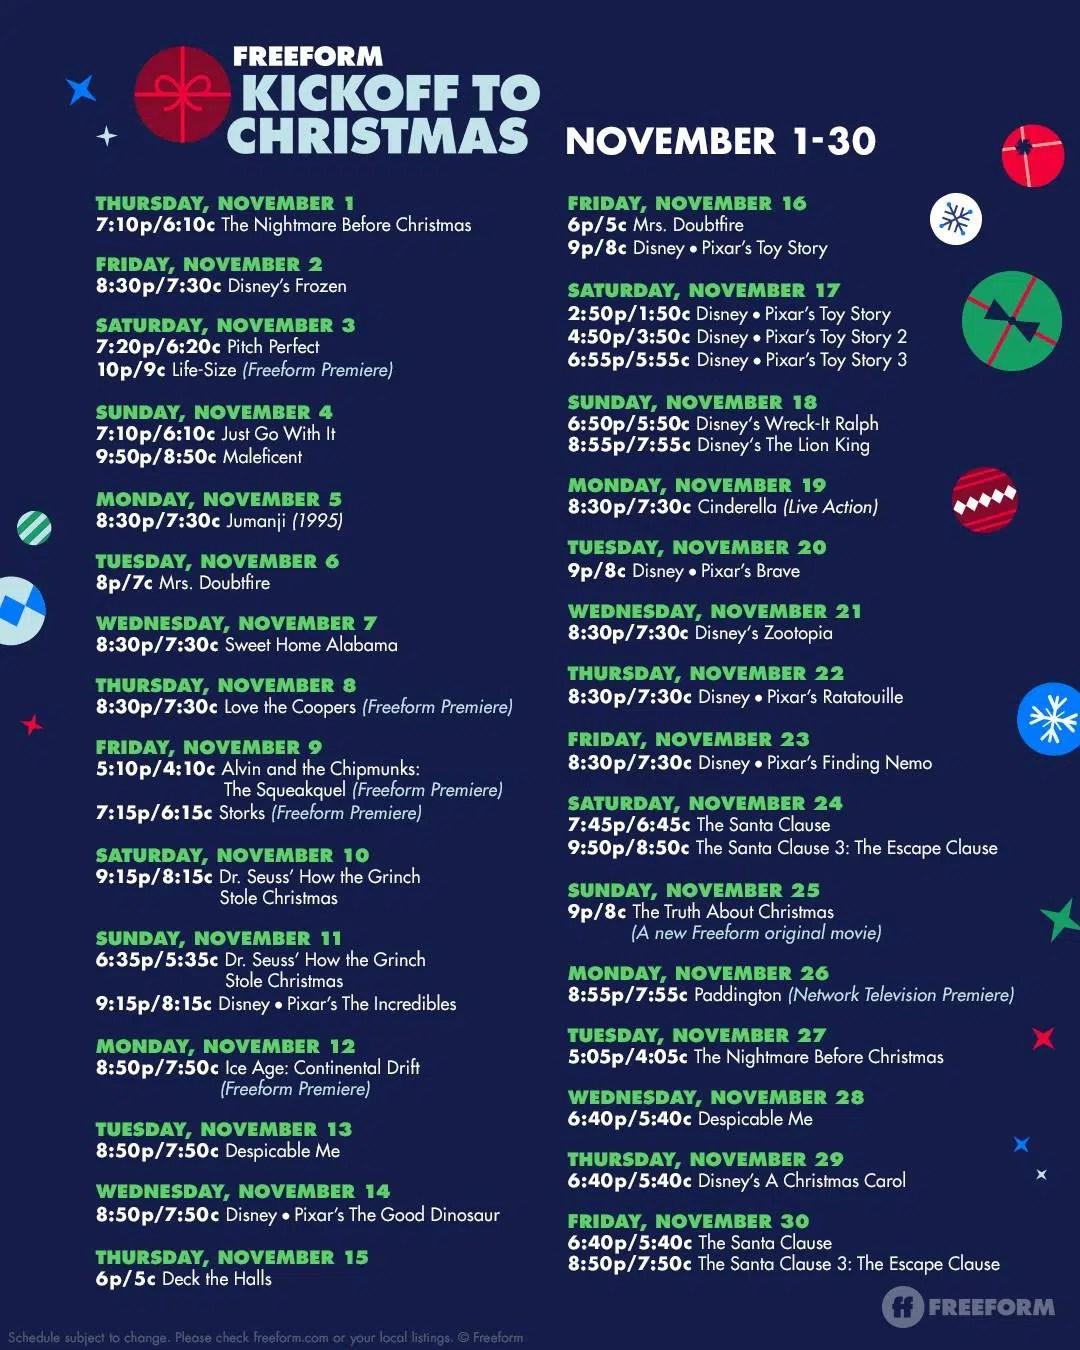 Freeform's Kickoff to Christmas Movie Schedule